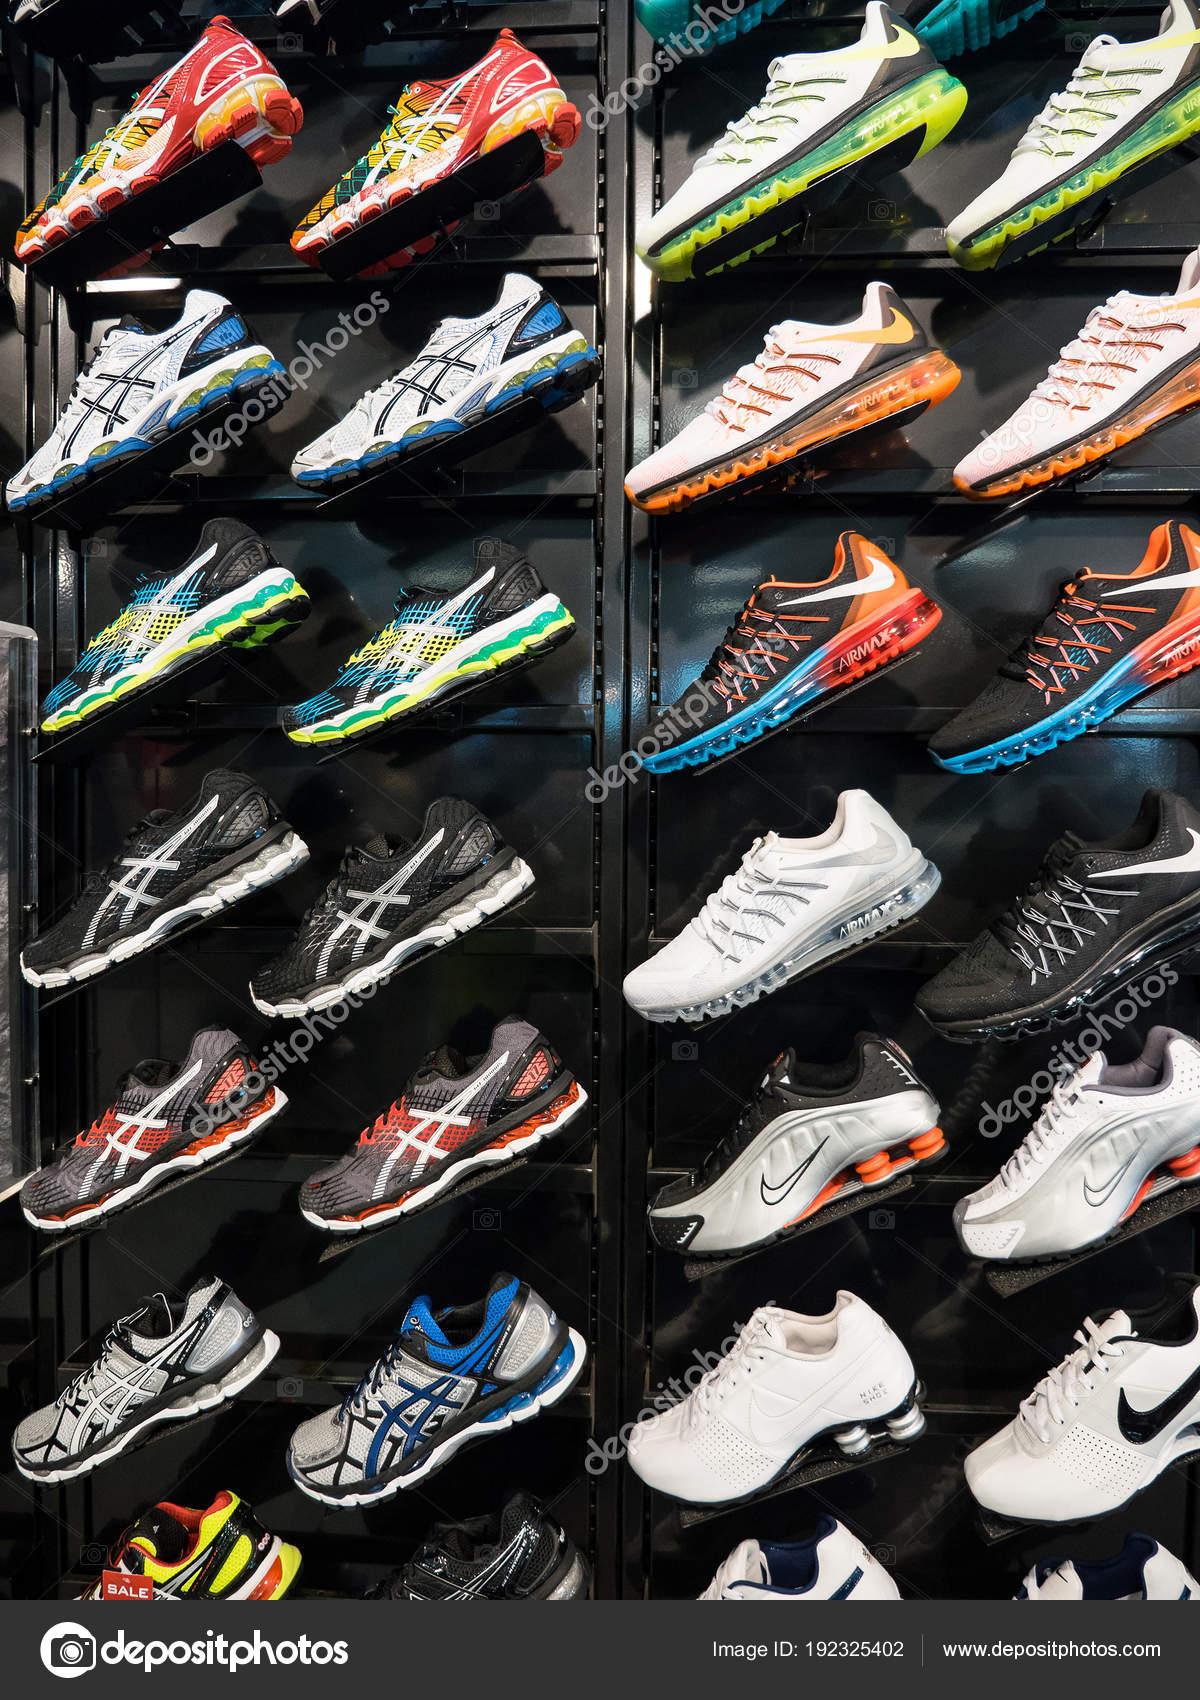 8e4d5b401e9 Πόλη της Νέας Υόρκης - Circa Μαΐου 2015: Έκθεση της nike αθλητικά παπούτσια.  Nike είναι ένας από τους παγκόσμιους μεγαλύτερους προμηθευτές αθλητικά ...